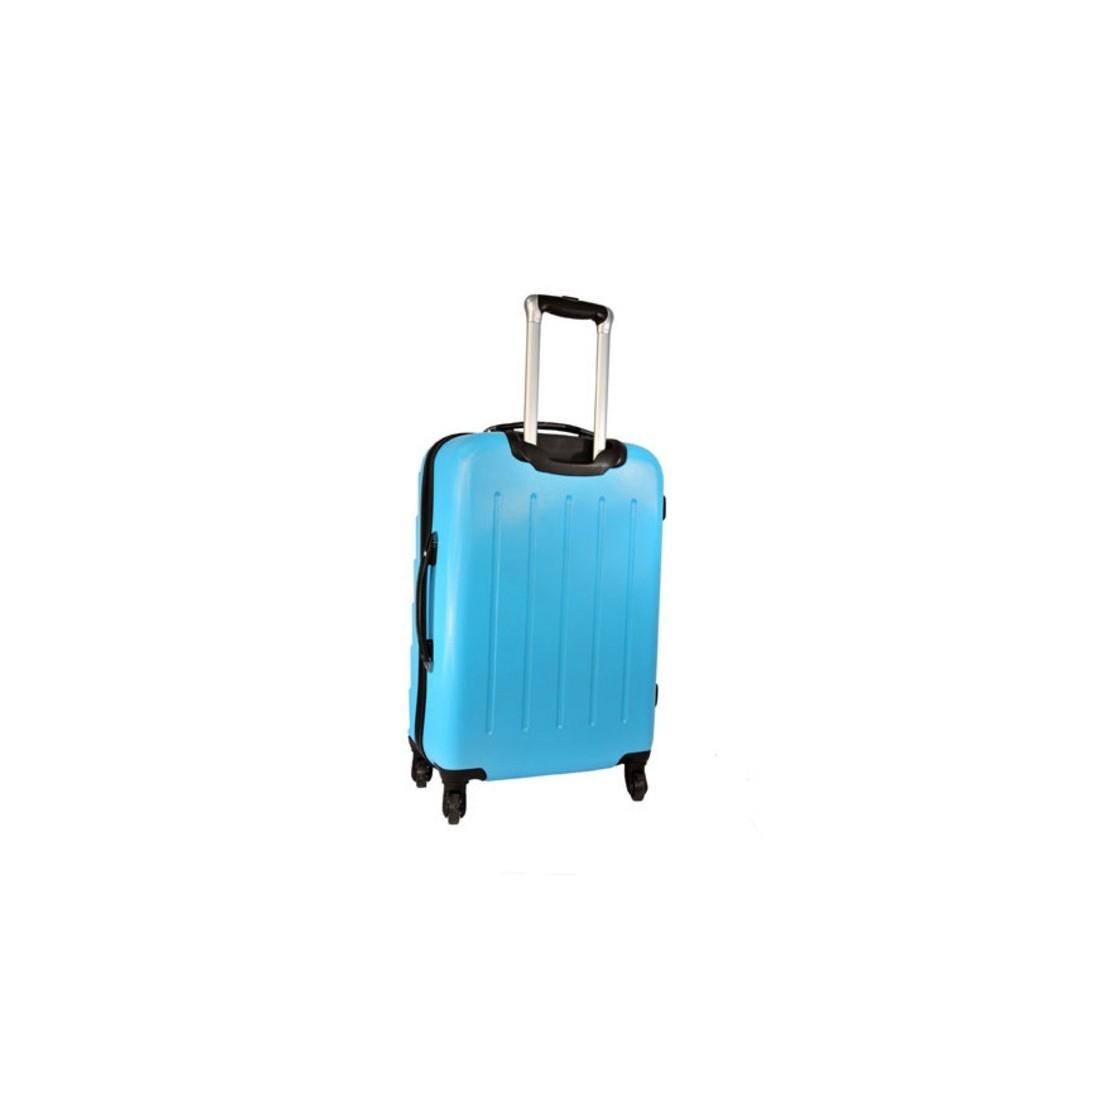 Walizka mała niebieska ABS - plecak-tornister.pl